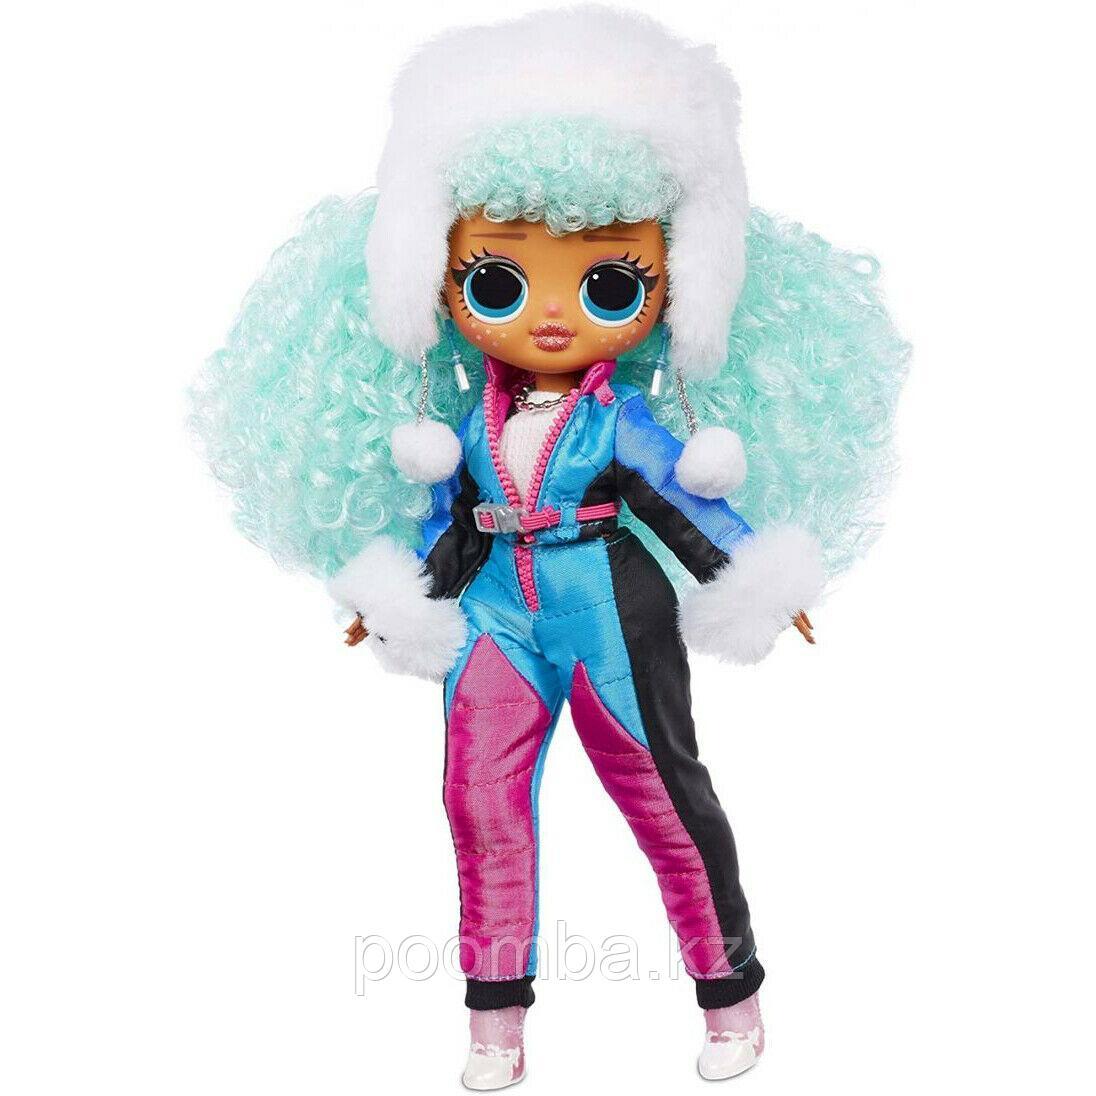 L.O.L. Кукла OMG Winter Chill Icy Gurl and Brrr B.B. - фото 1